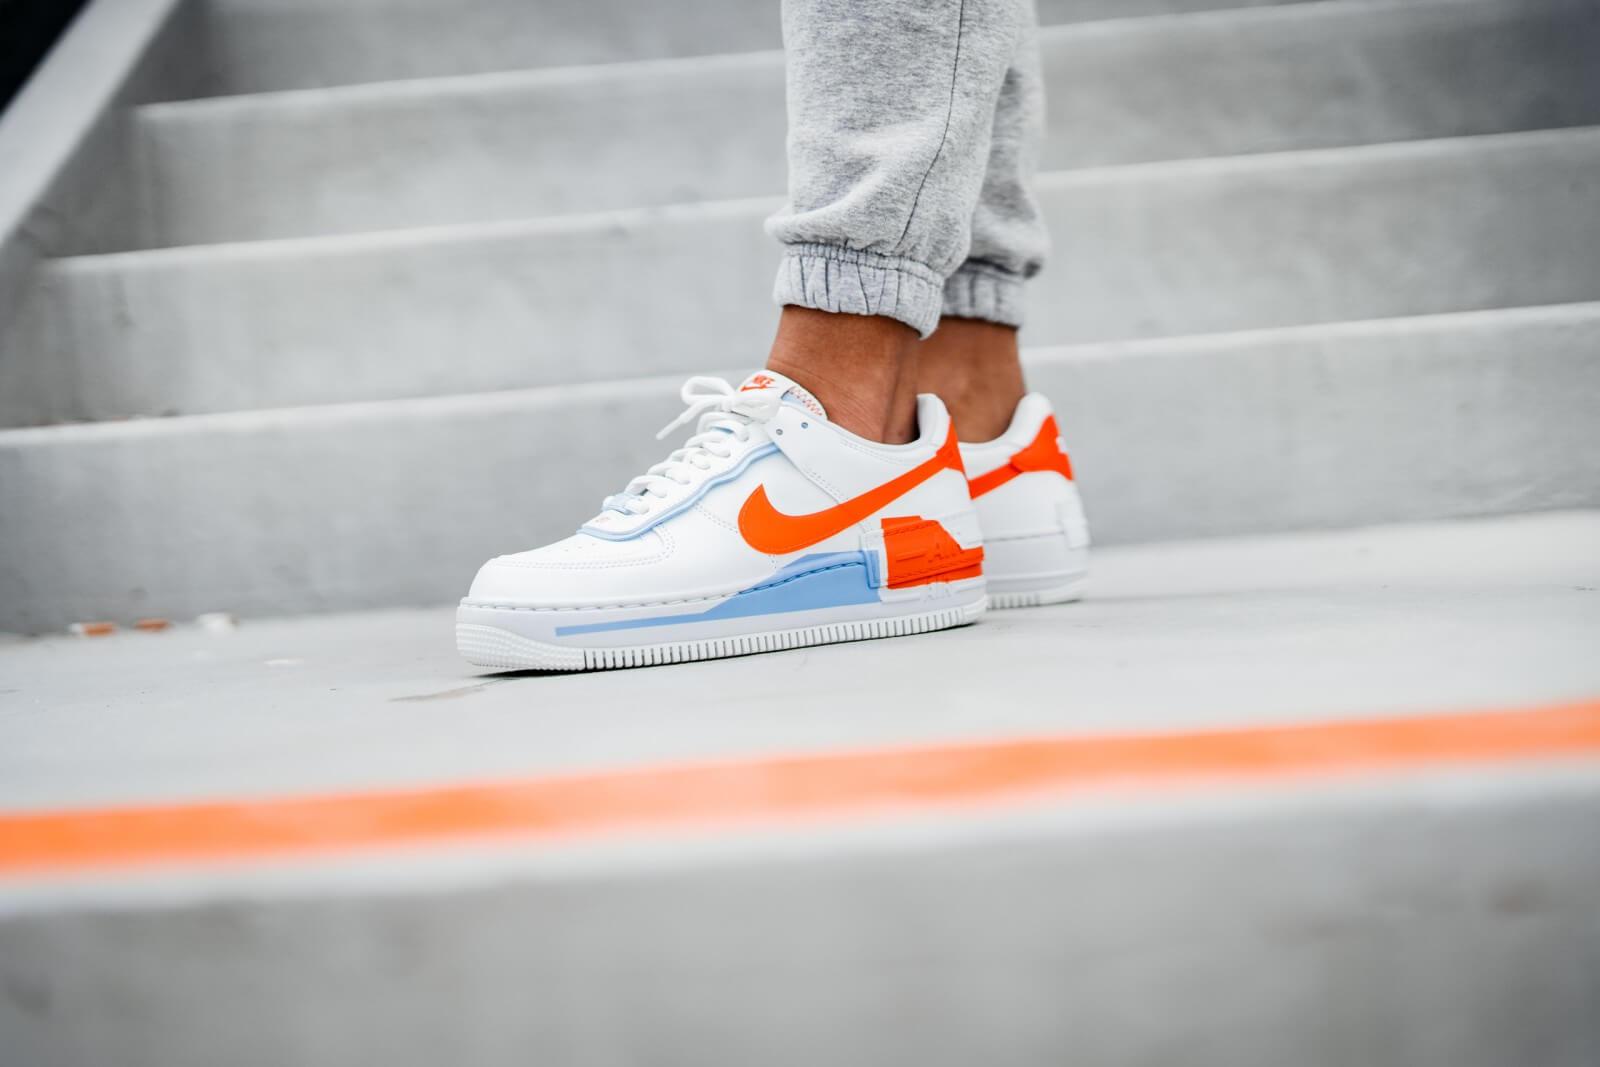 Nike Air Force 1 Shadow Summit White Team Orange : Release